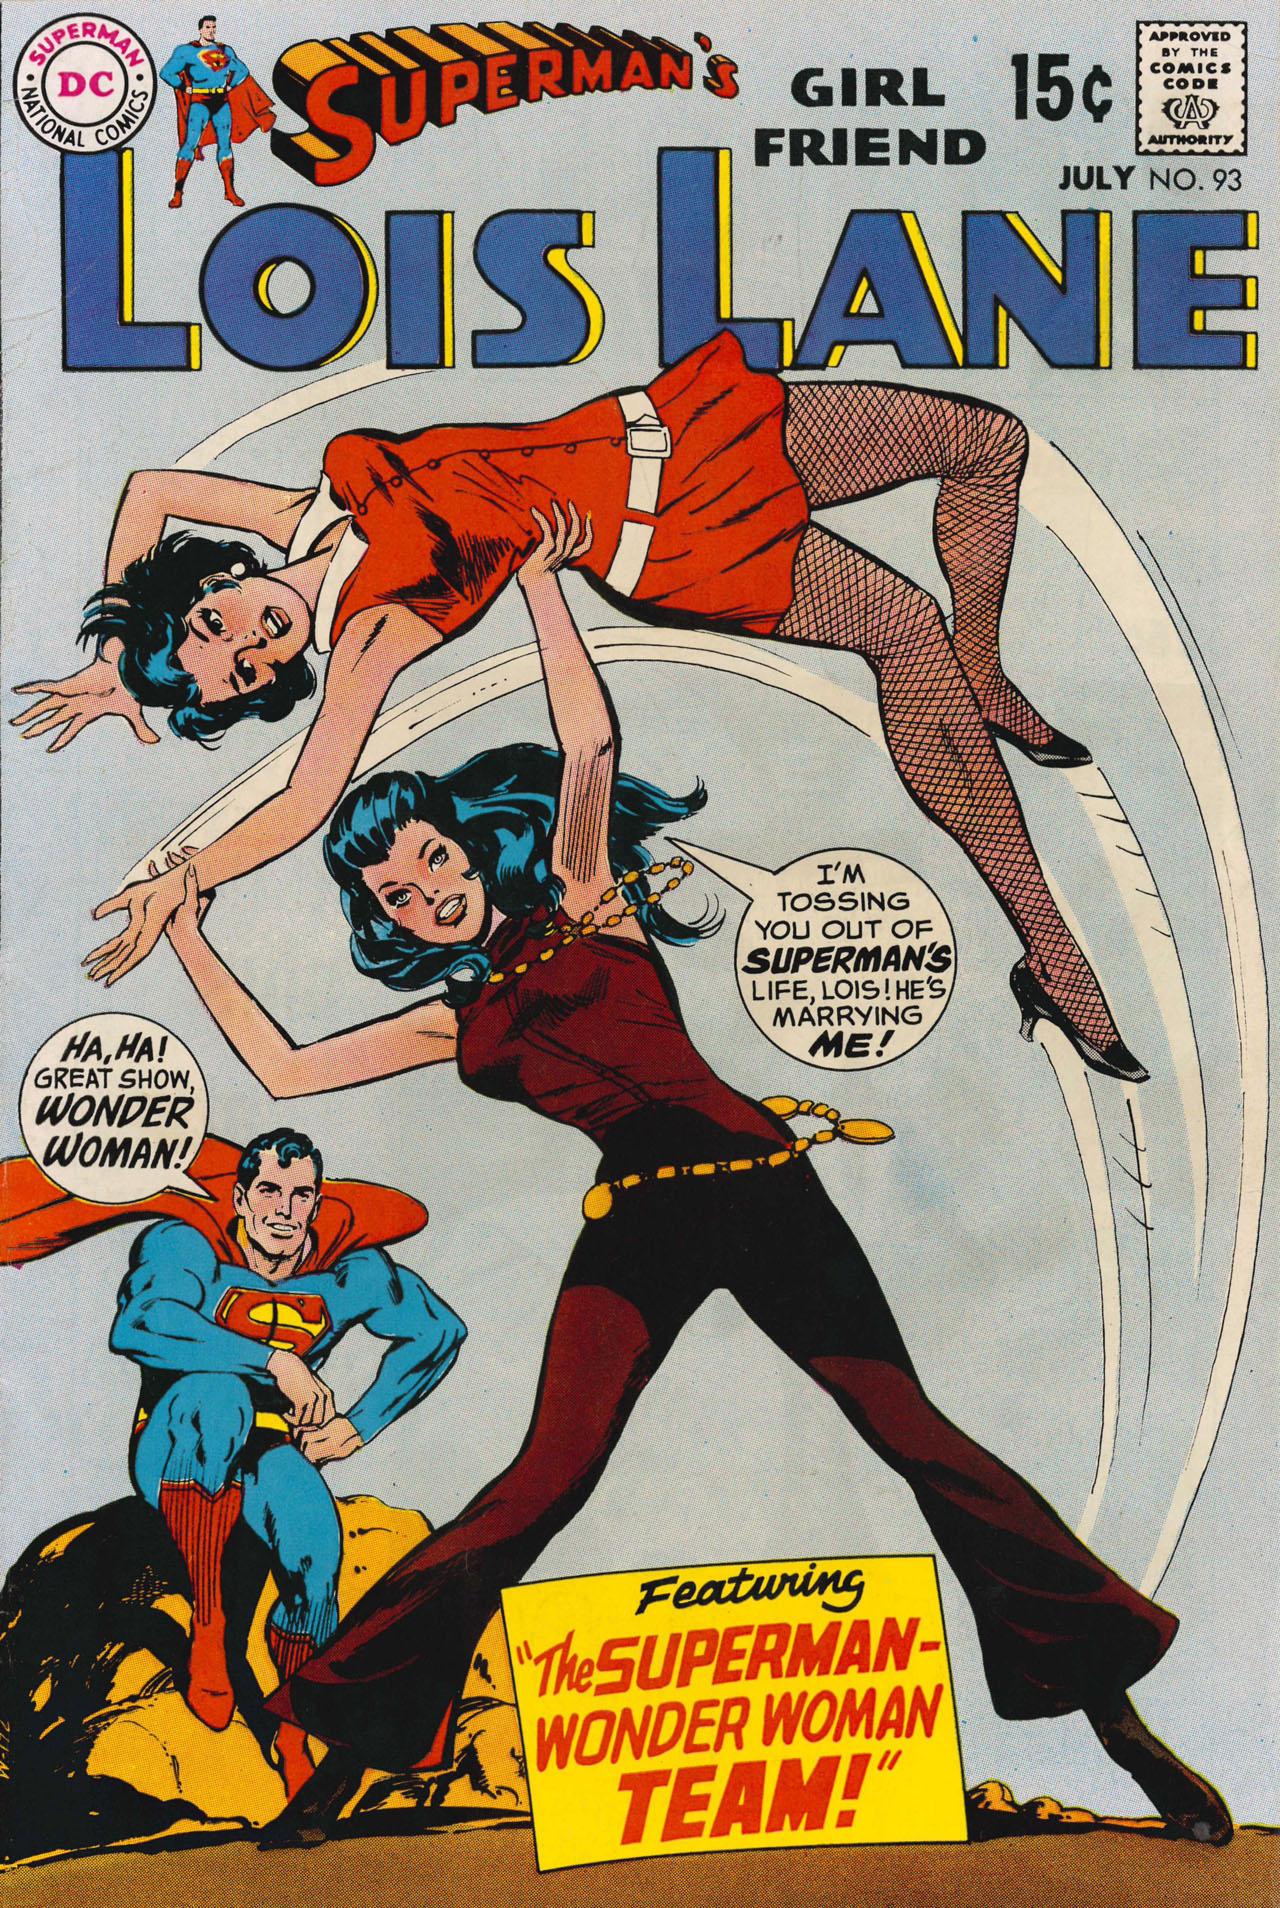 Superman's Girl Friend, Lois Lane Vol 1 93